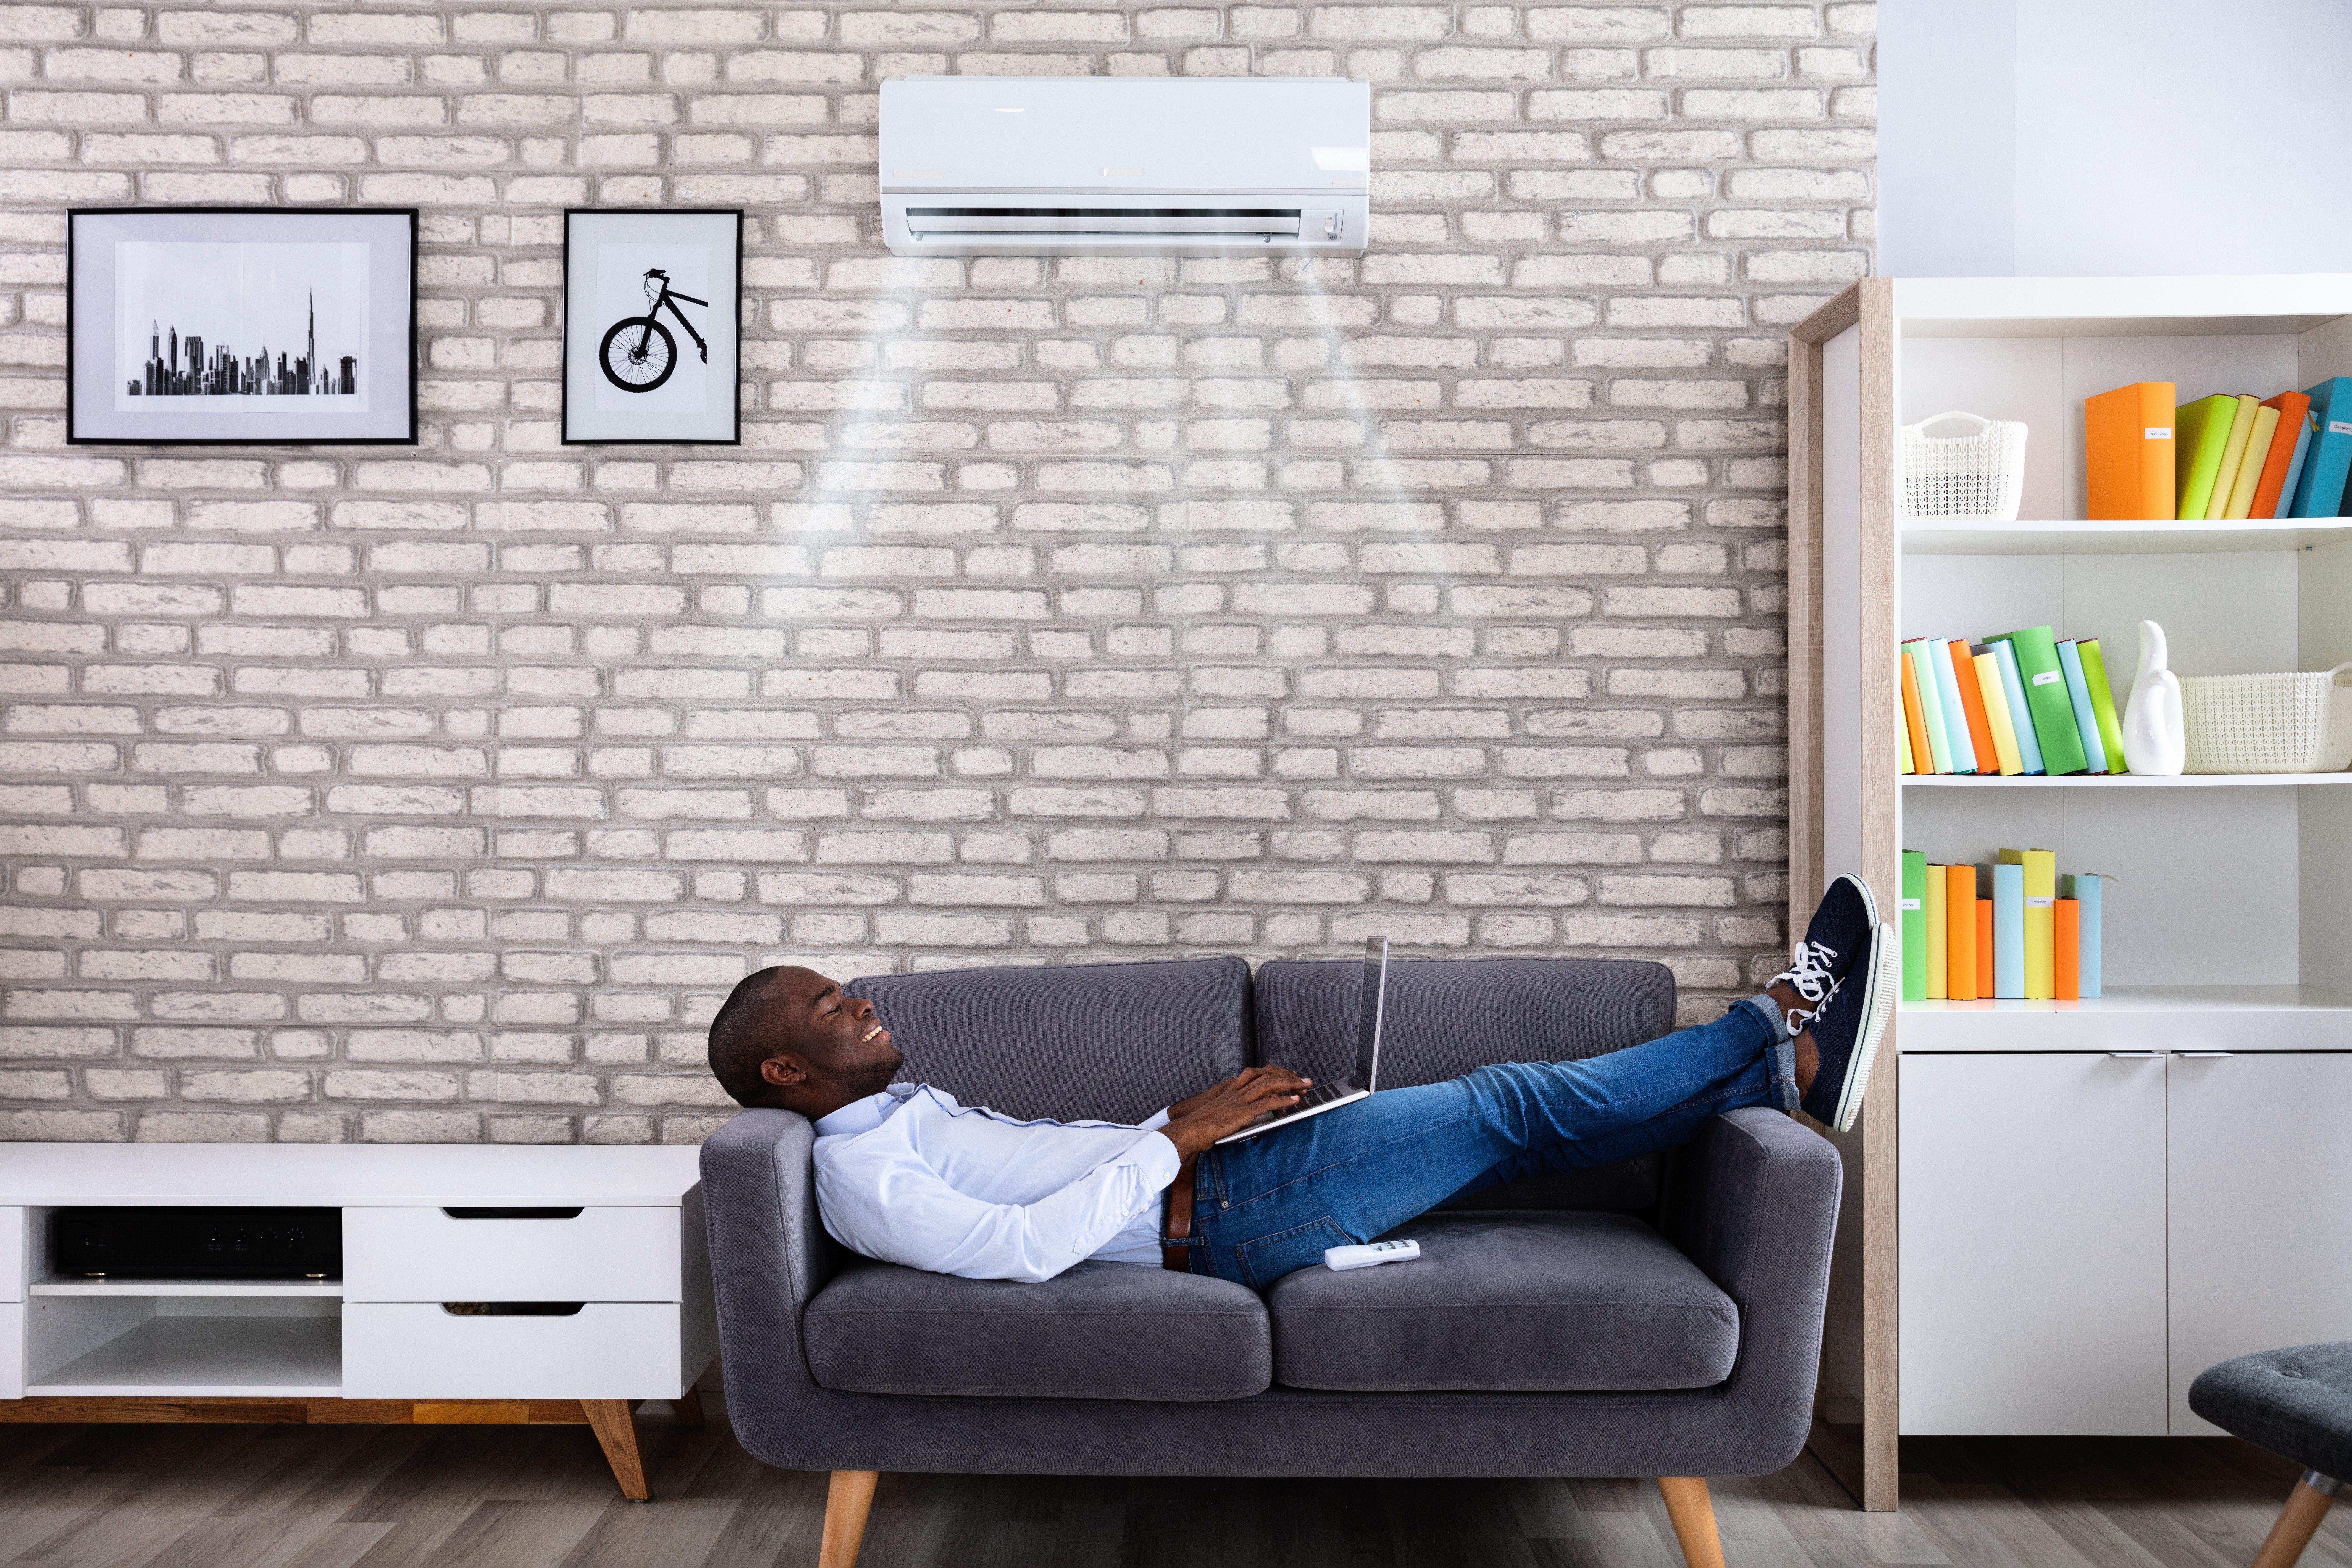 Pin On Inspiration Bedroom Wall Decor Ideas